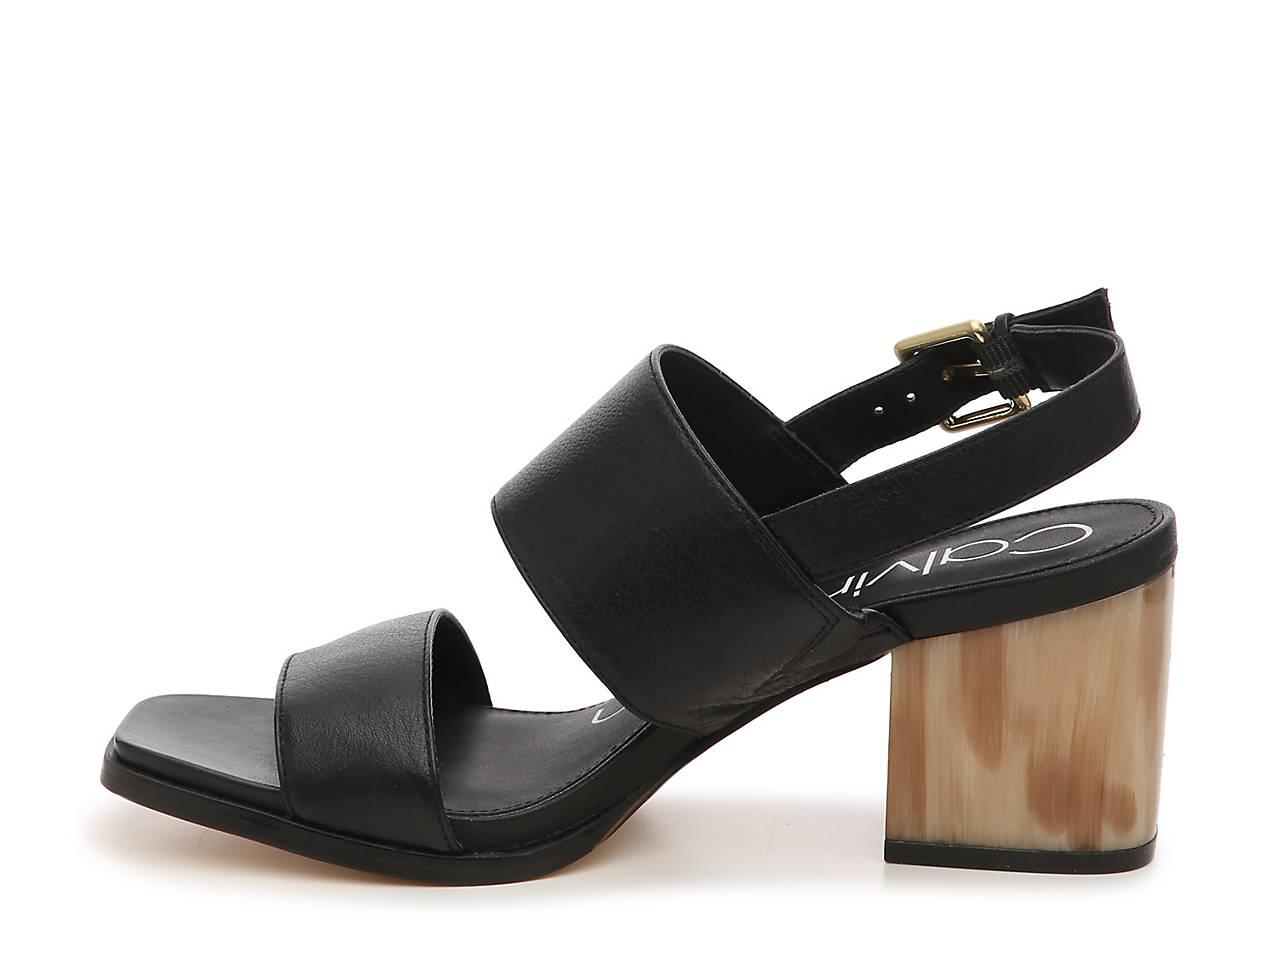 4305d0ff84e5 Calvin Klein Rosemary Crevo Sandal Women s Shoes